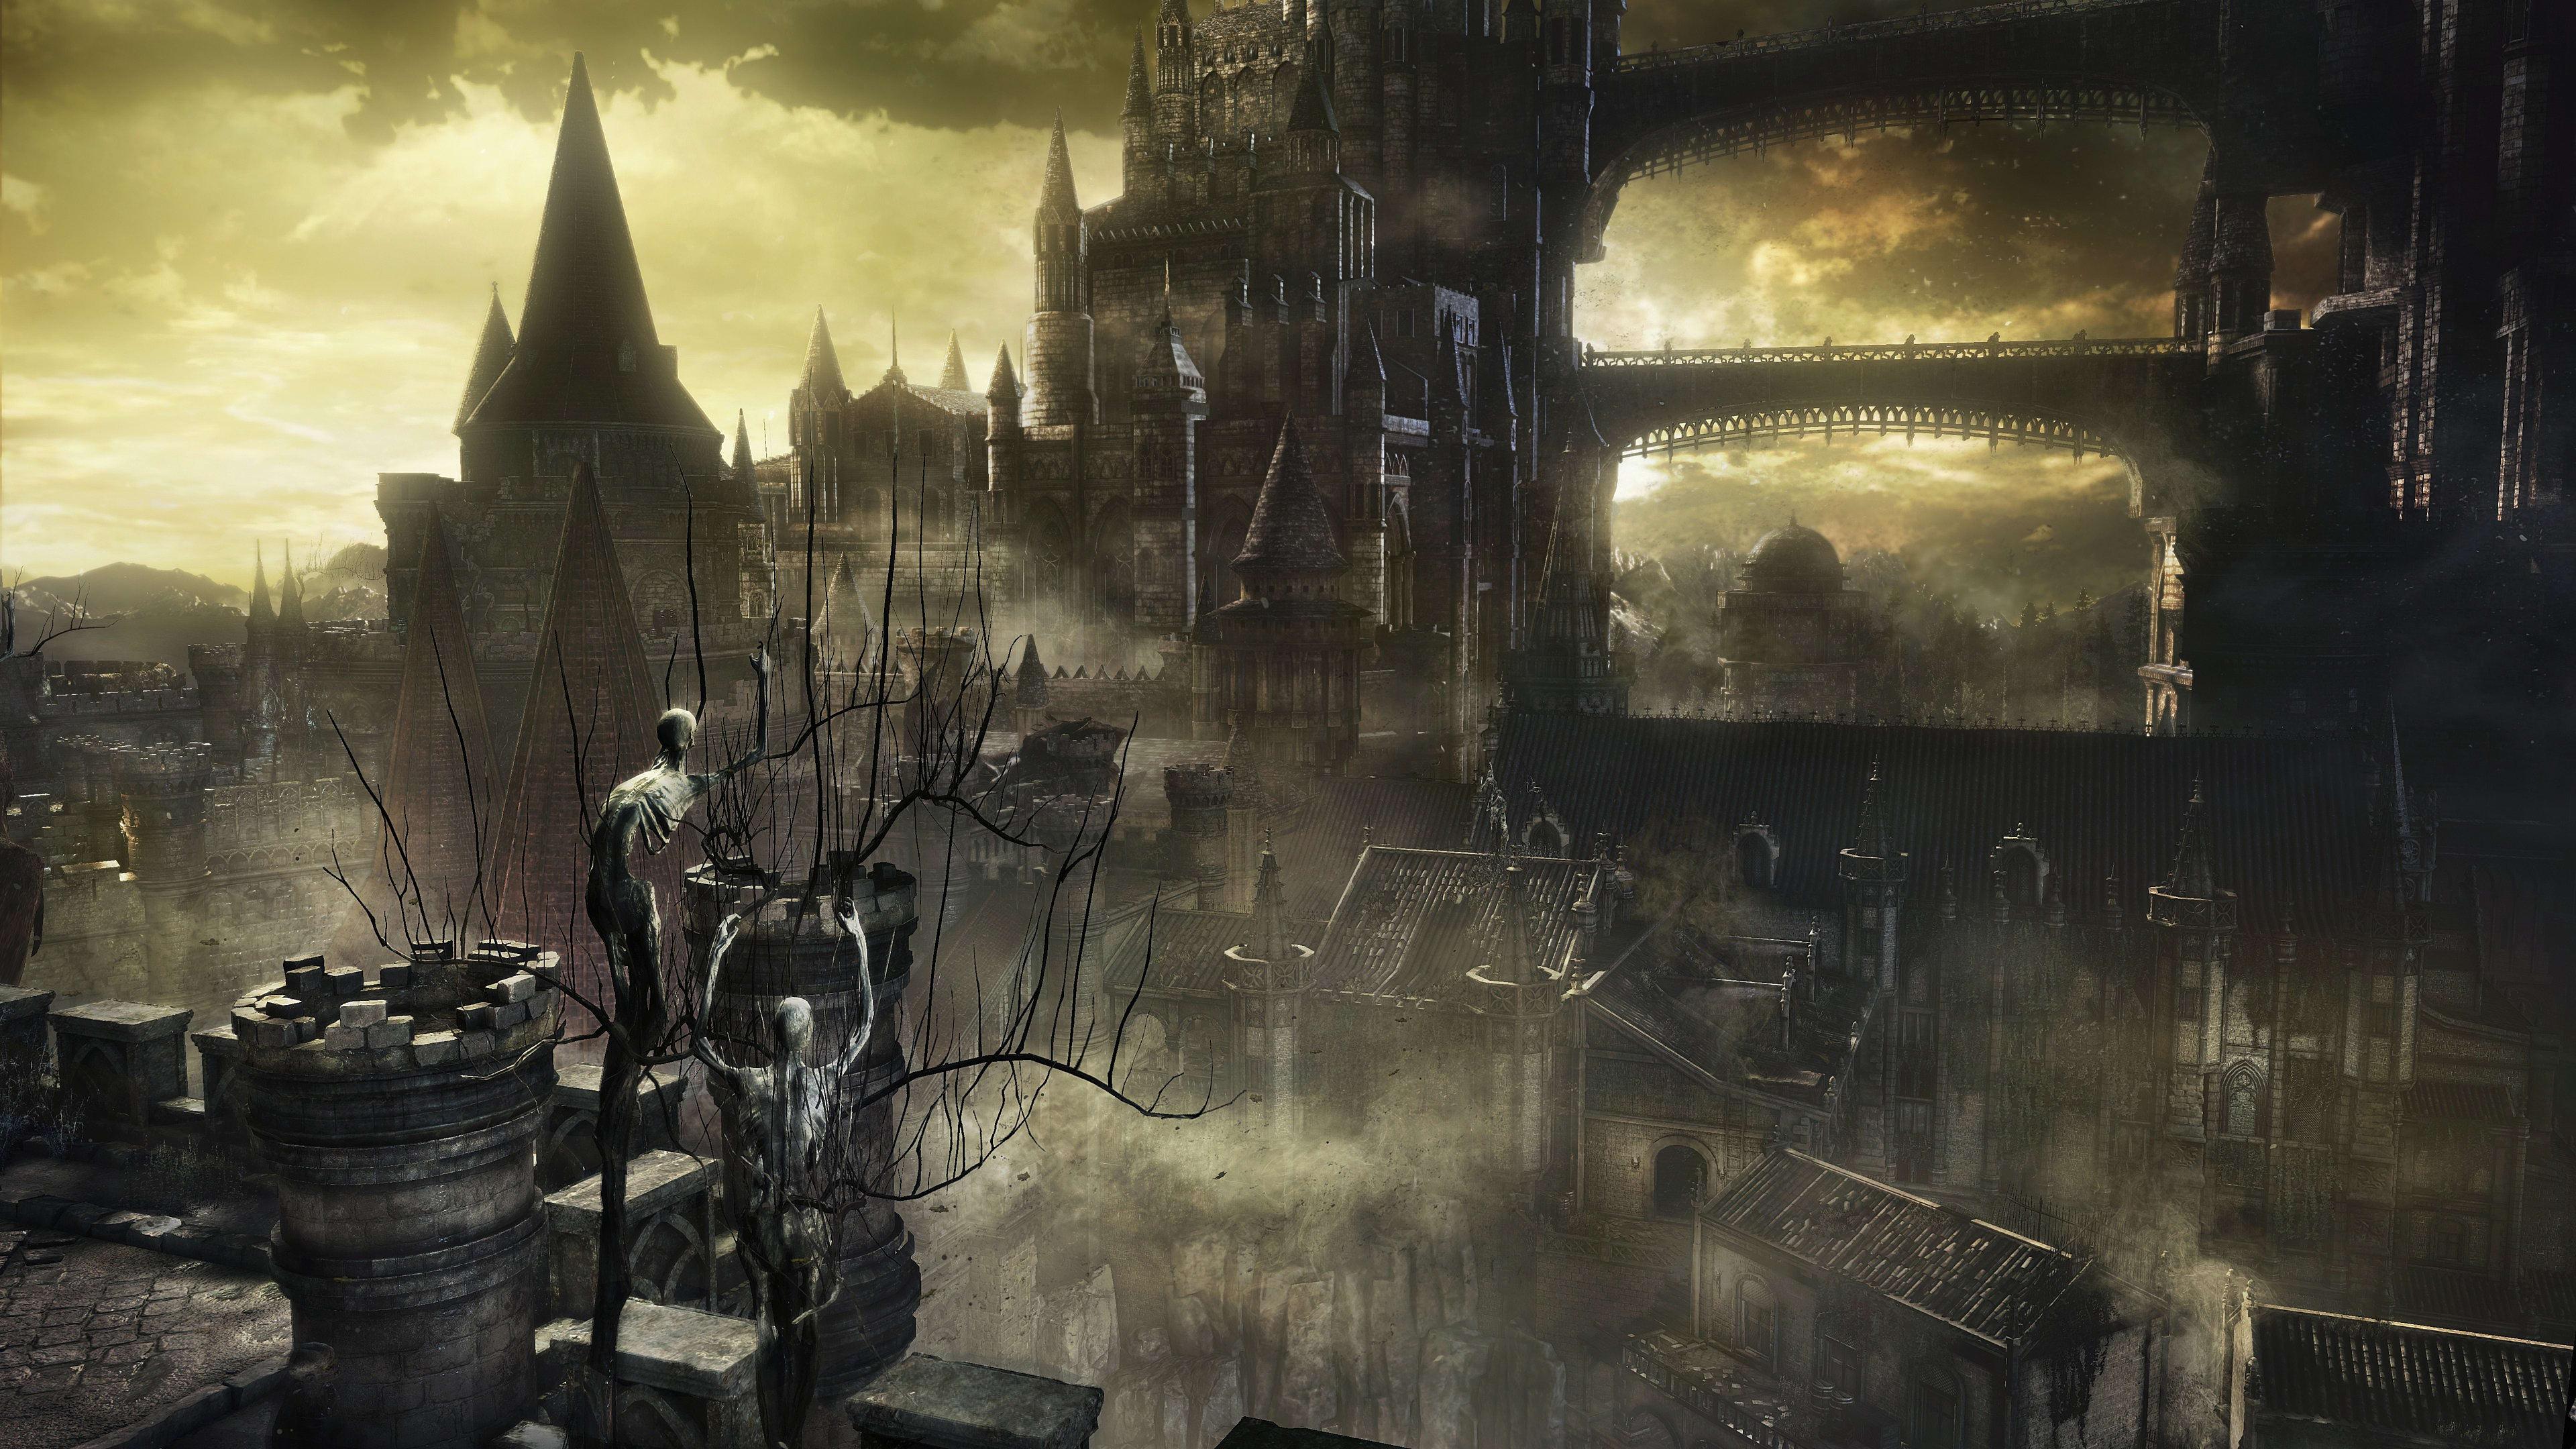 Screenshots Of Dark Souls 3 Straight From Gamescom